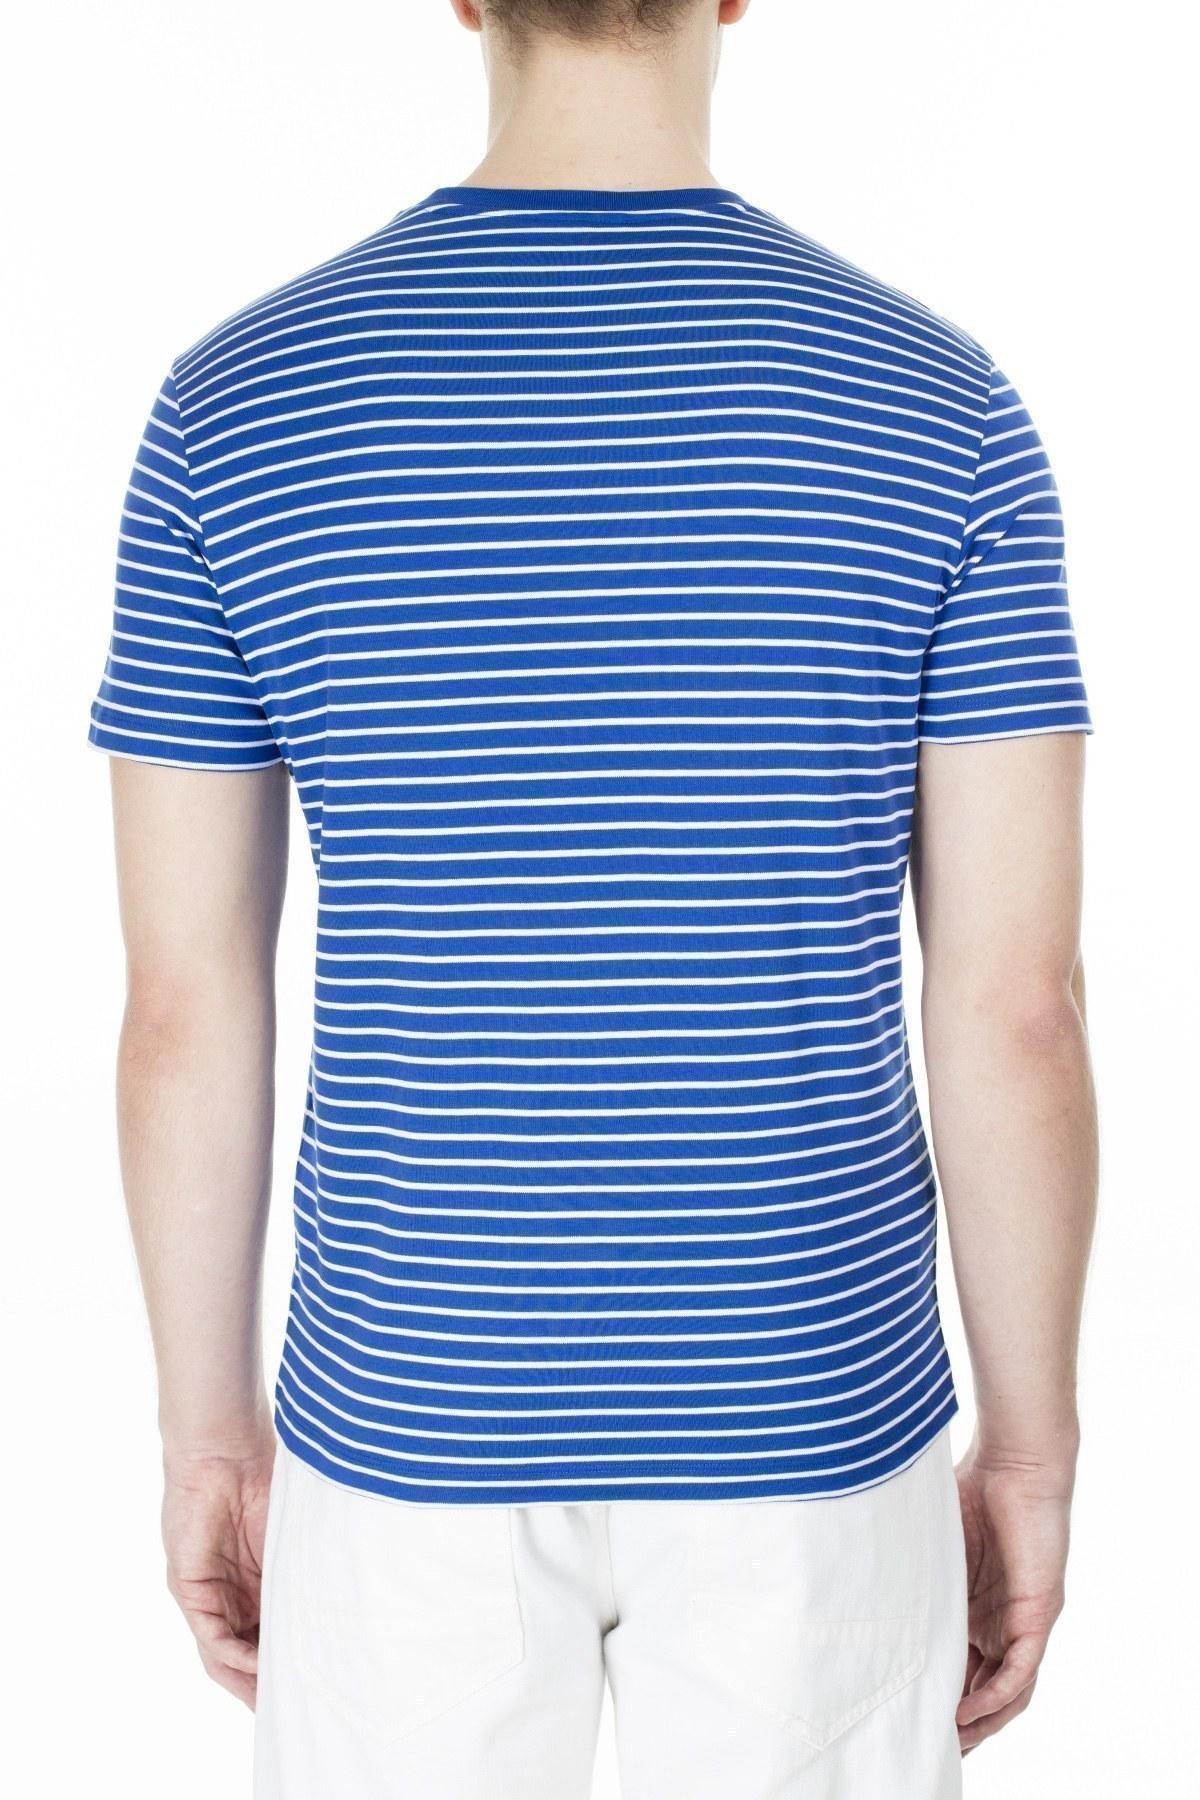 Emporio Armani Erkek T Shirt 3H1T69 1JEQZ F909 SAKS